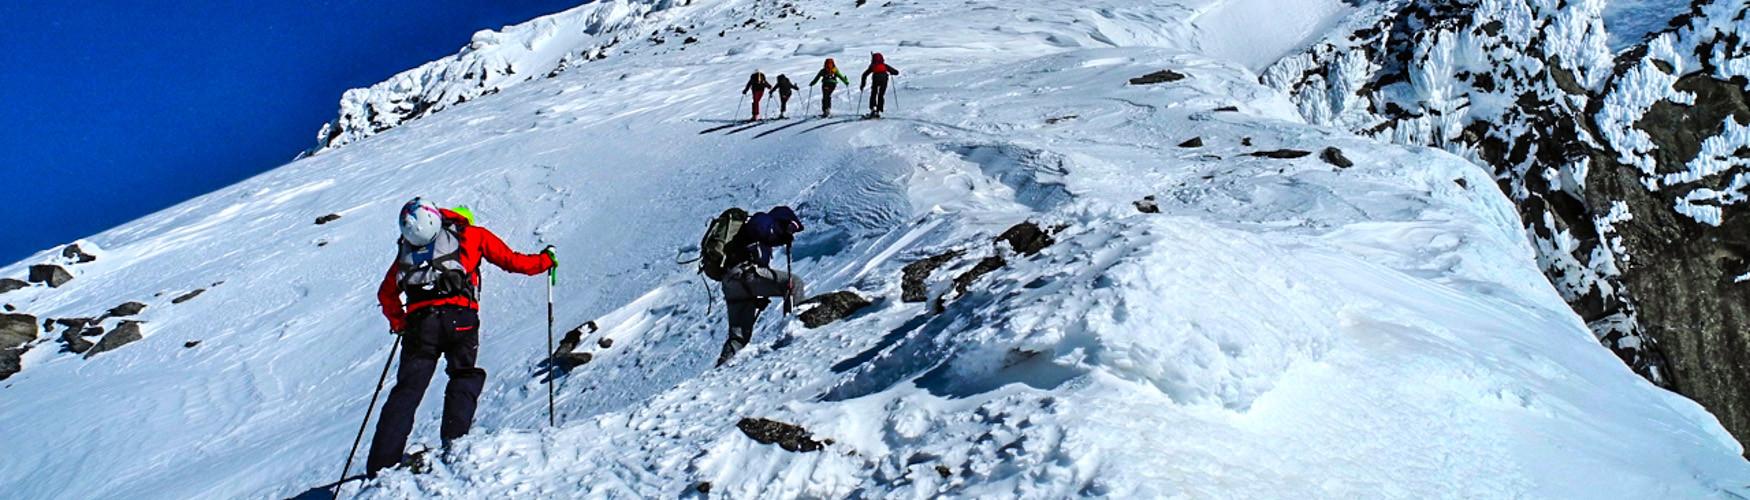 Skitour Transalp, Alpenüberquerung Ski, Alpenüberquerung Skitour